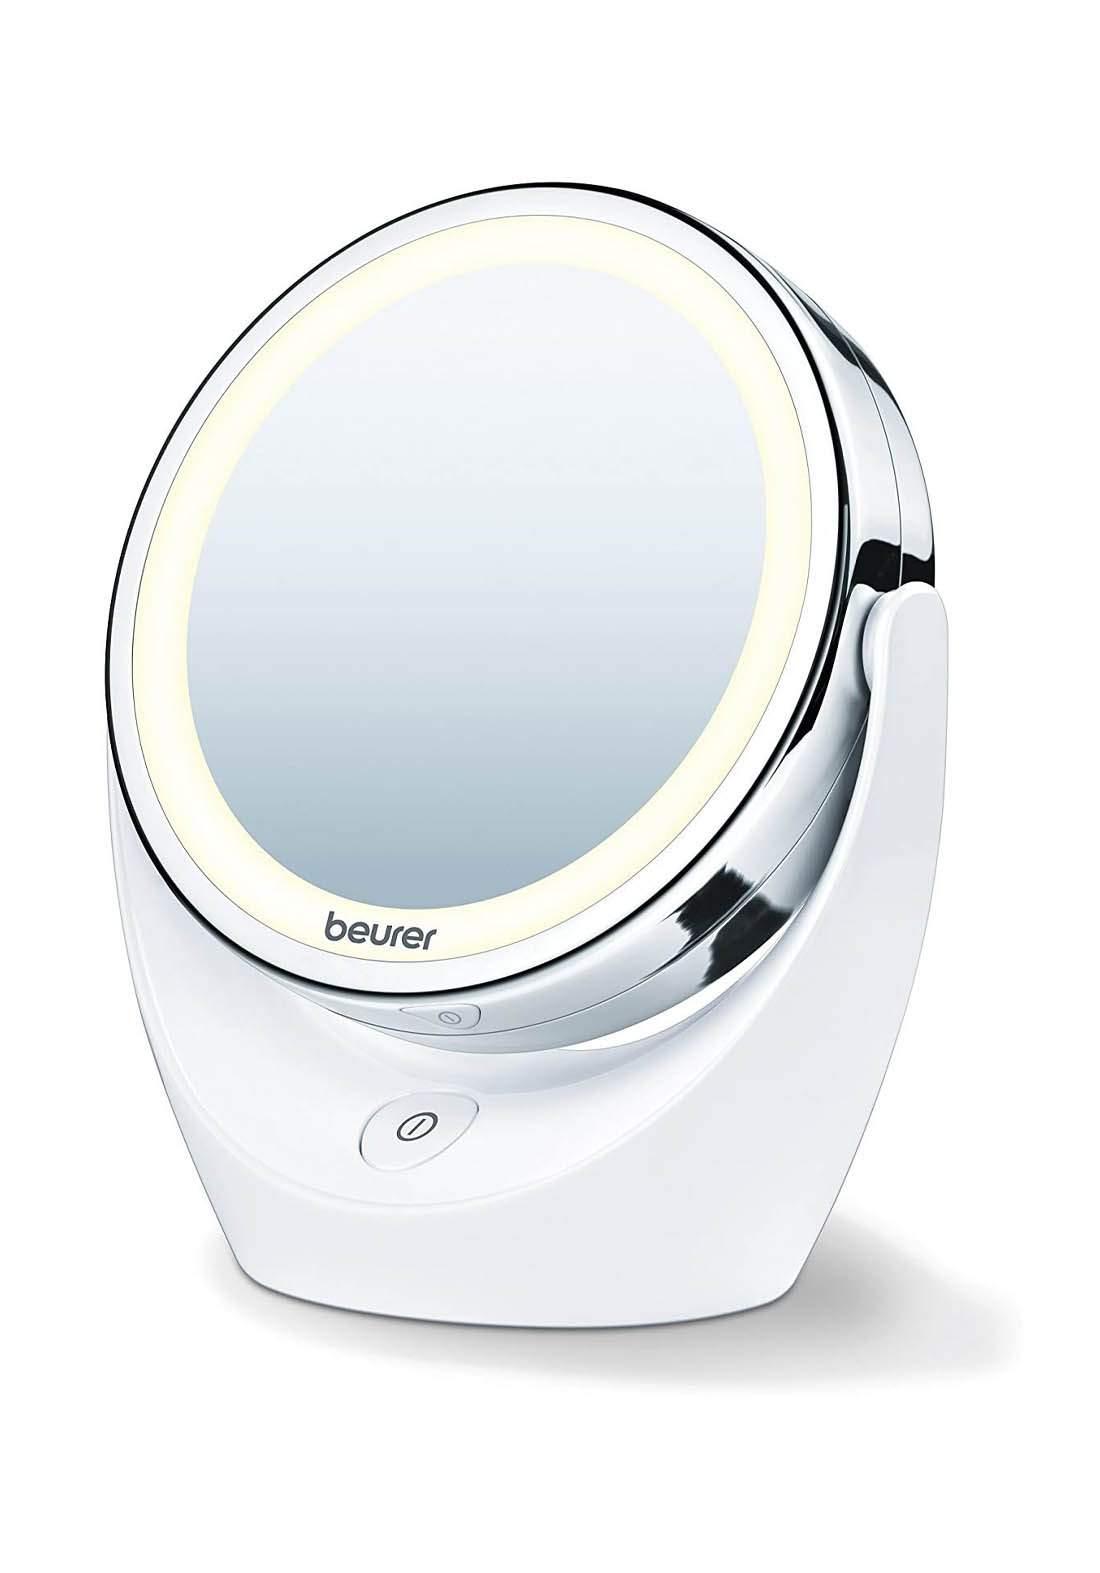 Beurer BS 49 Illuminated Cosmetics Mirror مرآة مضاءة مكبرة